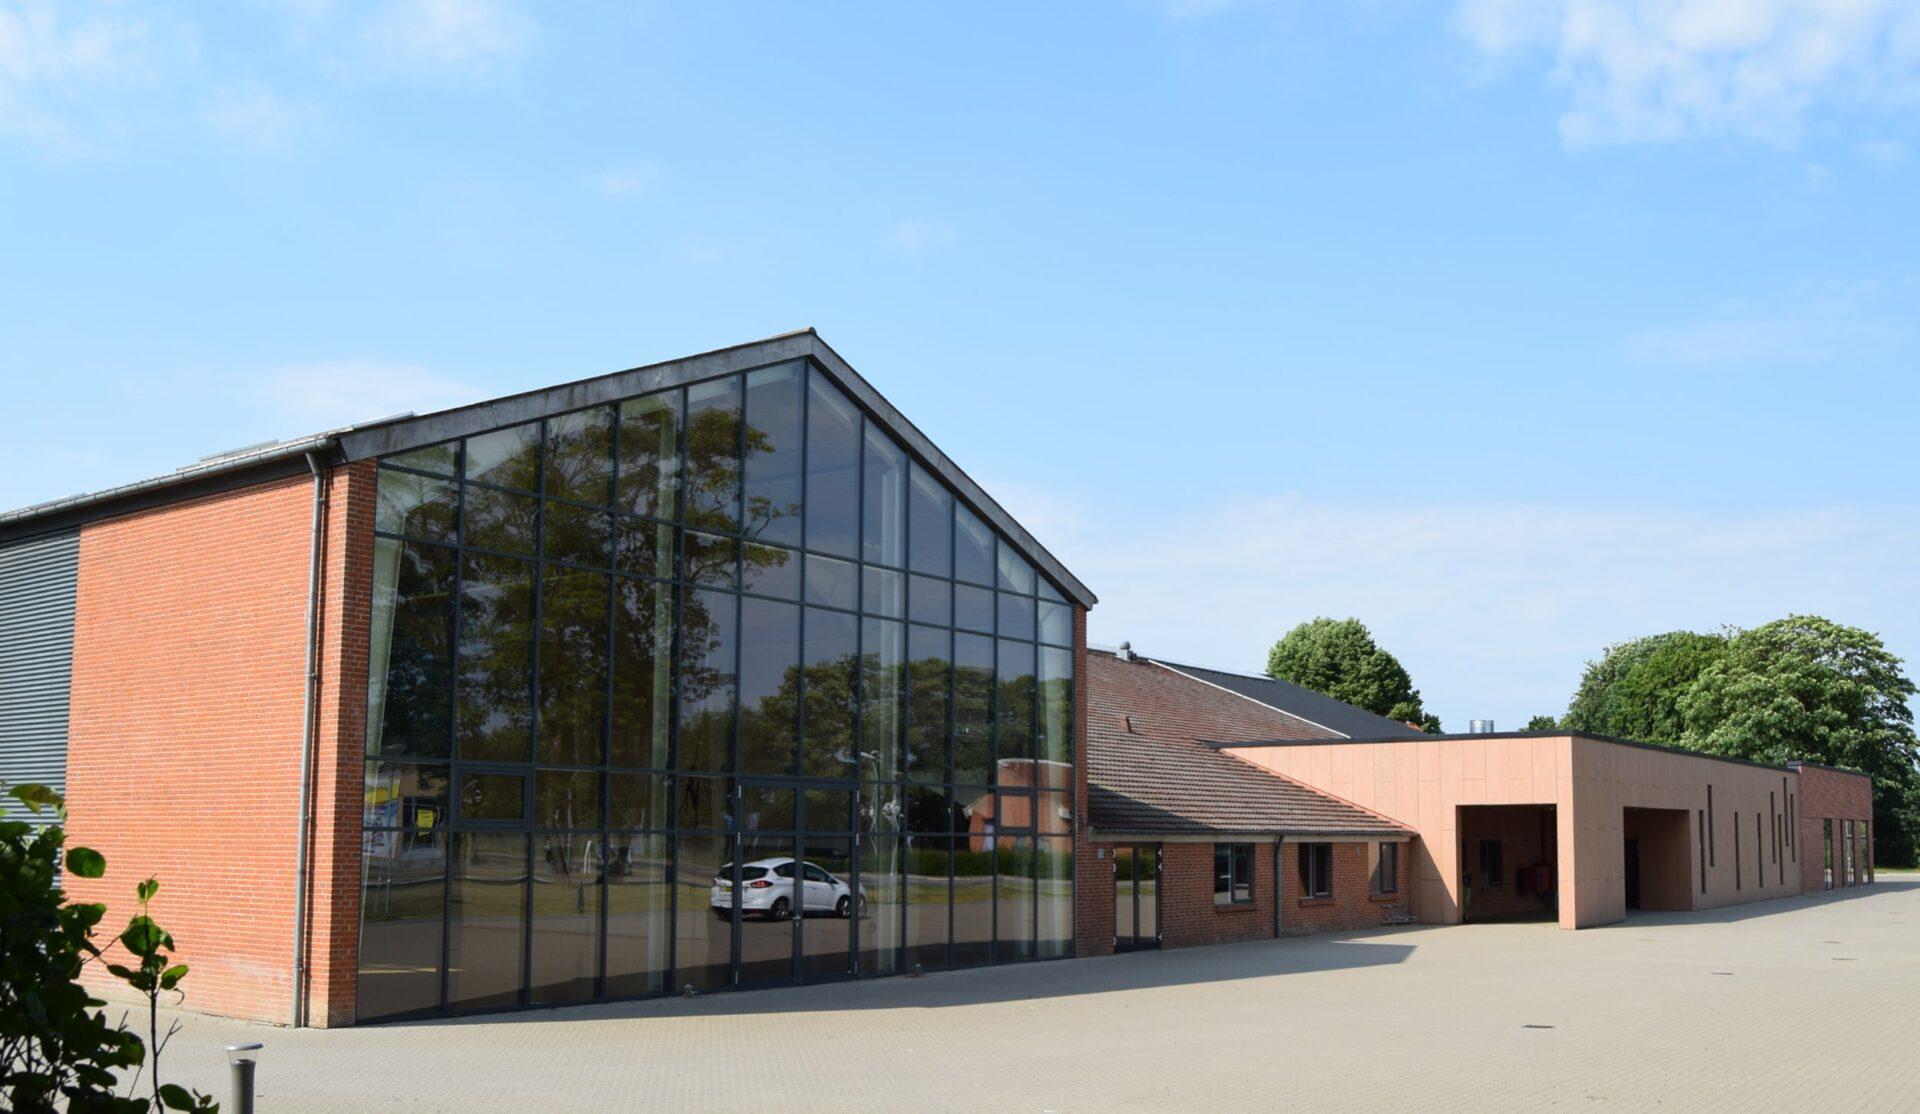 Idrætsefterskolen Lægården